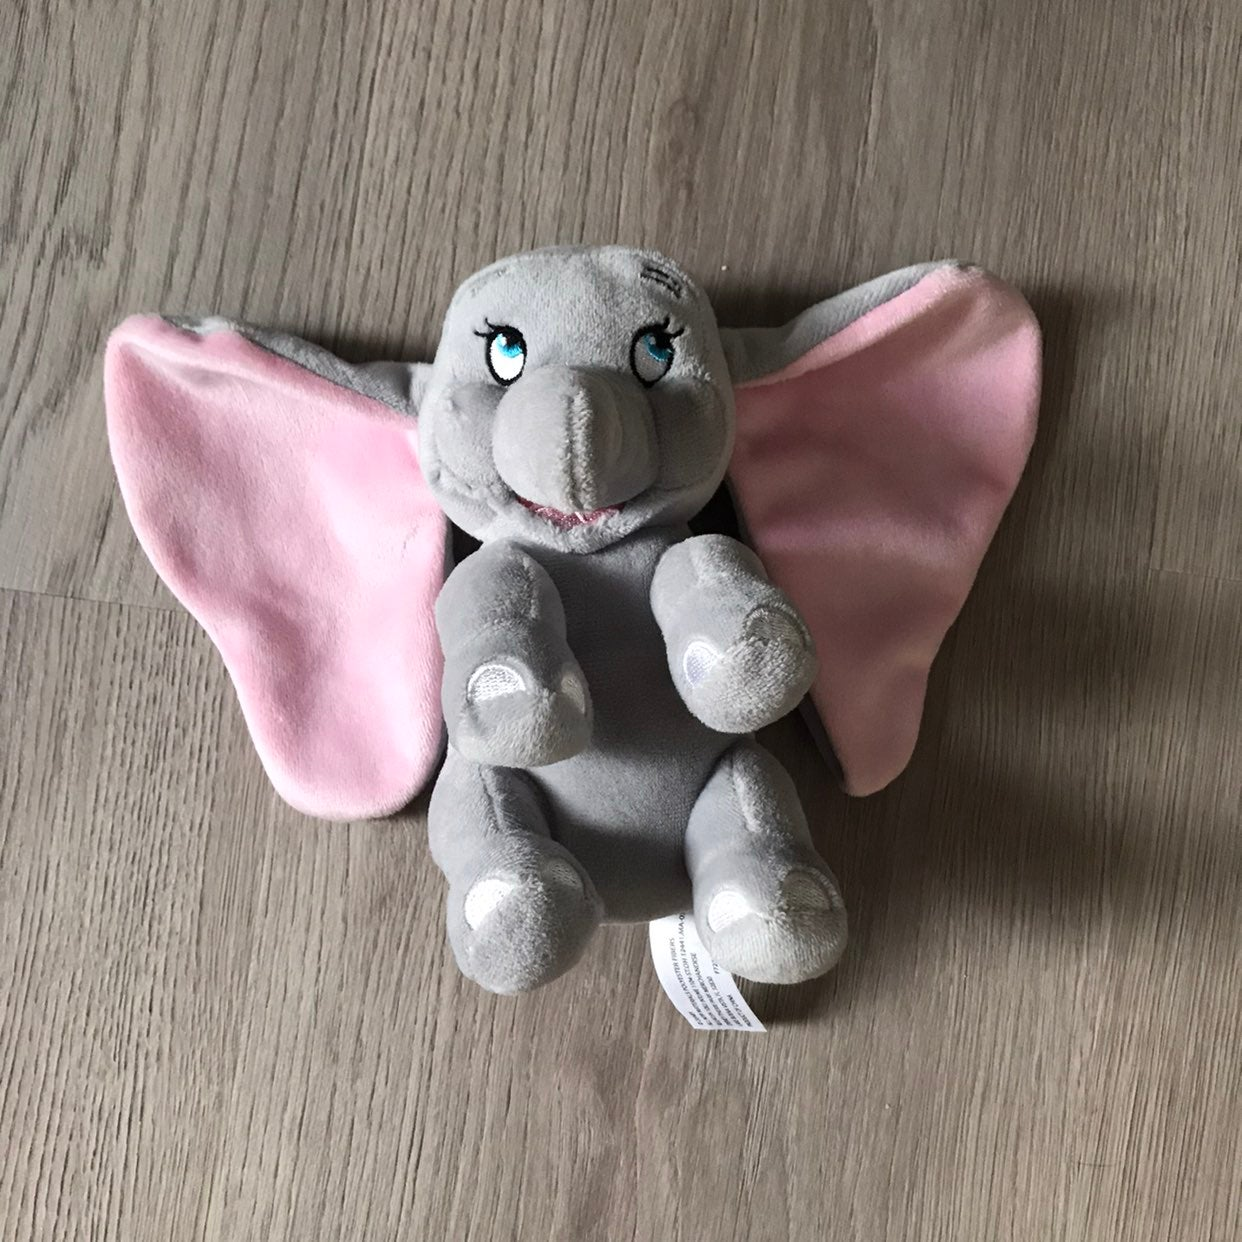 Small Dumbo Plush from Disney World